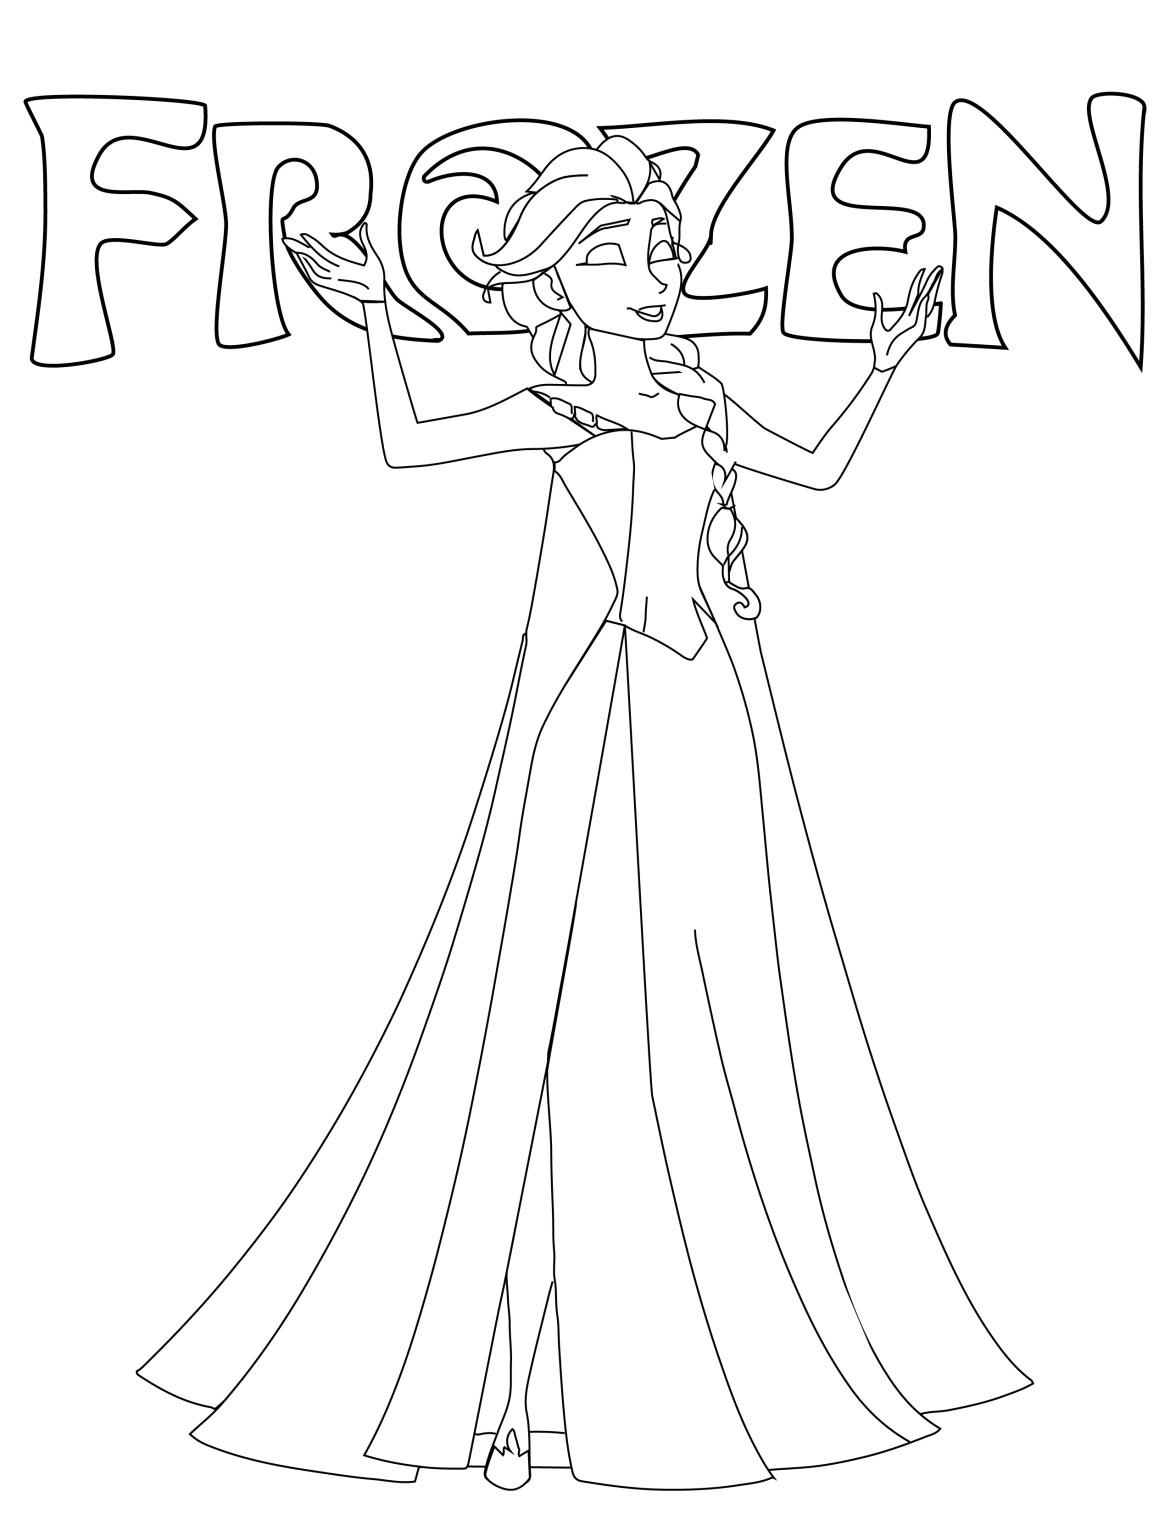 Disney Frozen Elsa Coloriage Noel Gratuit à Imprimer Artherapieca